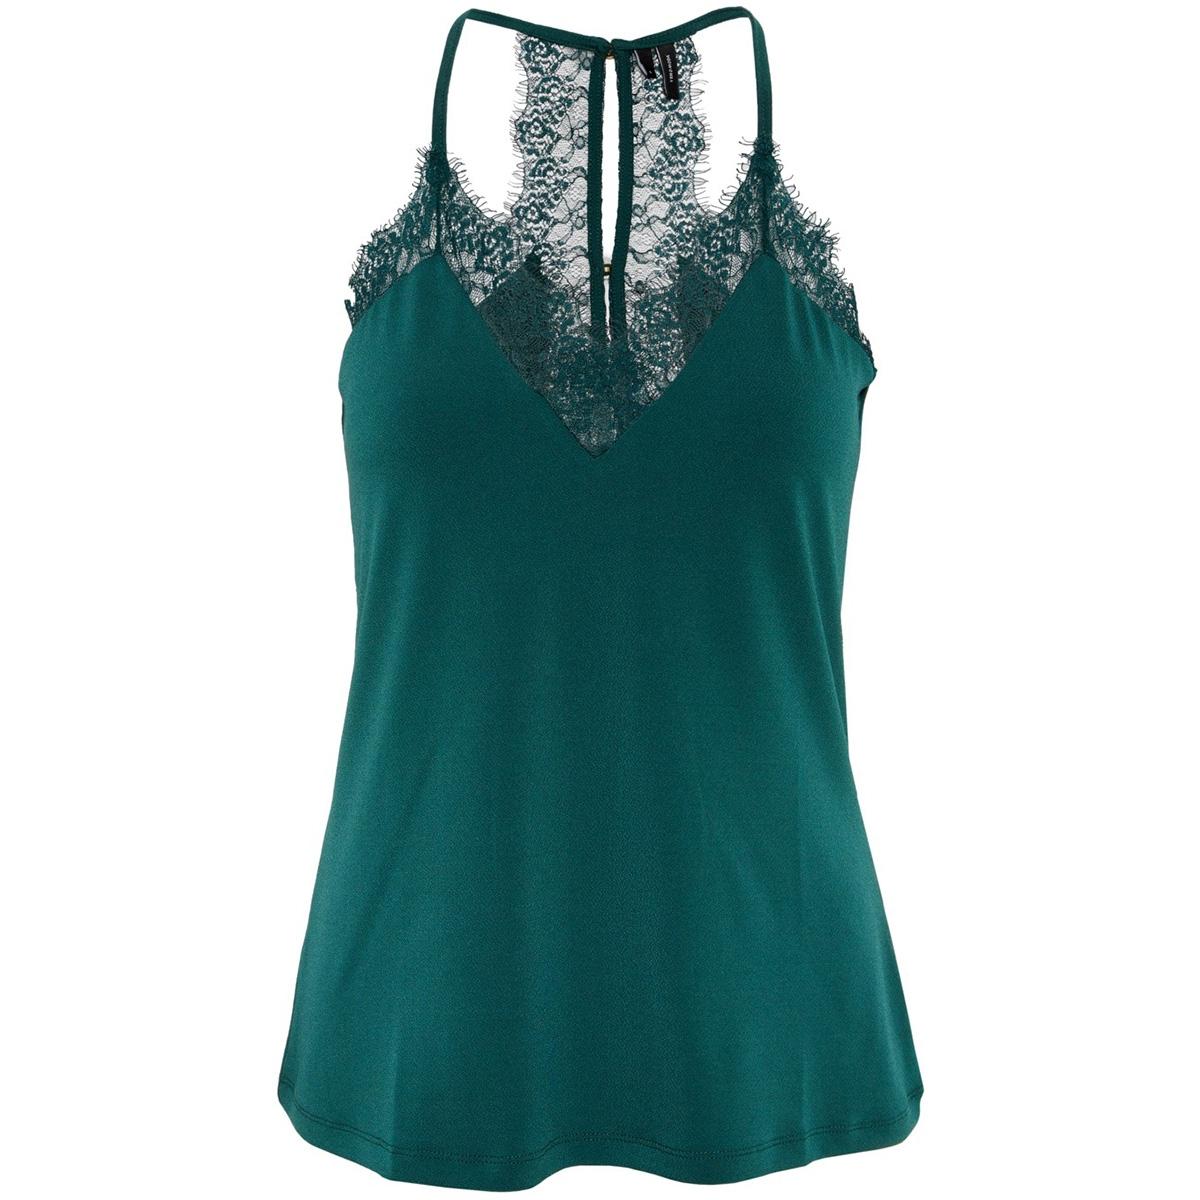 vmmilla s/l lace top color 10209420 vero moda top ponderosa pine